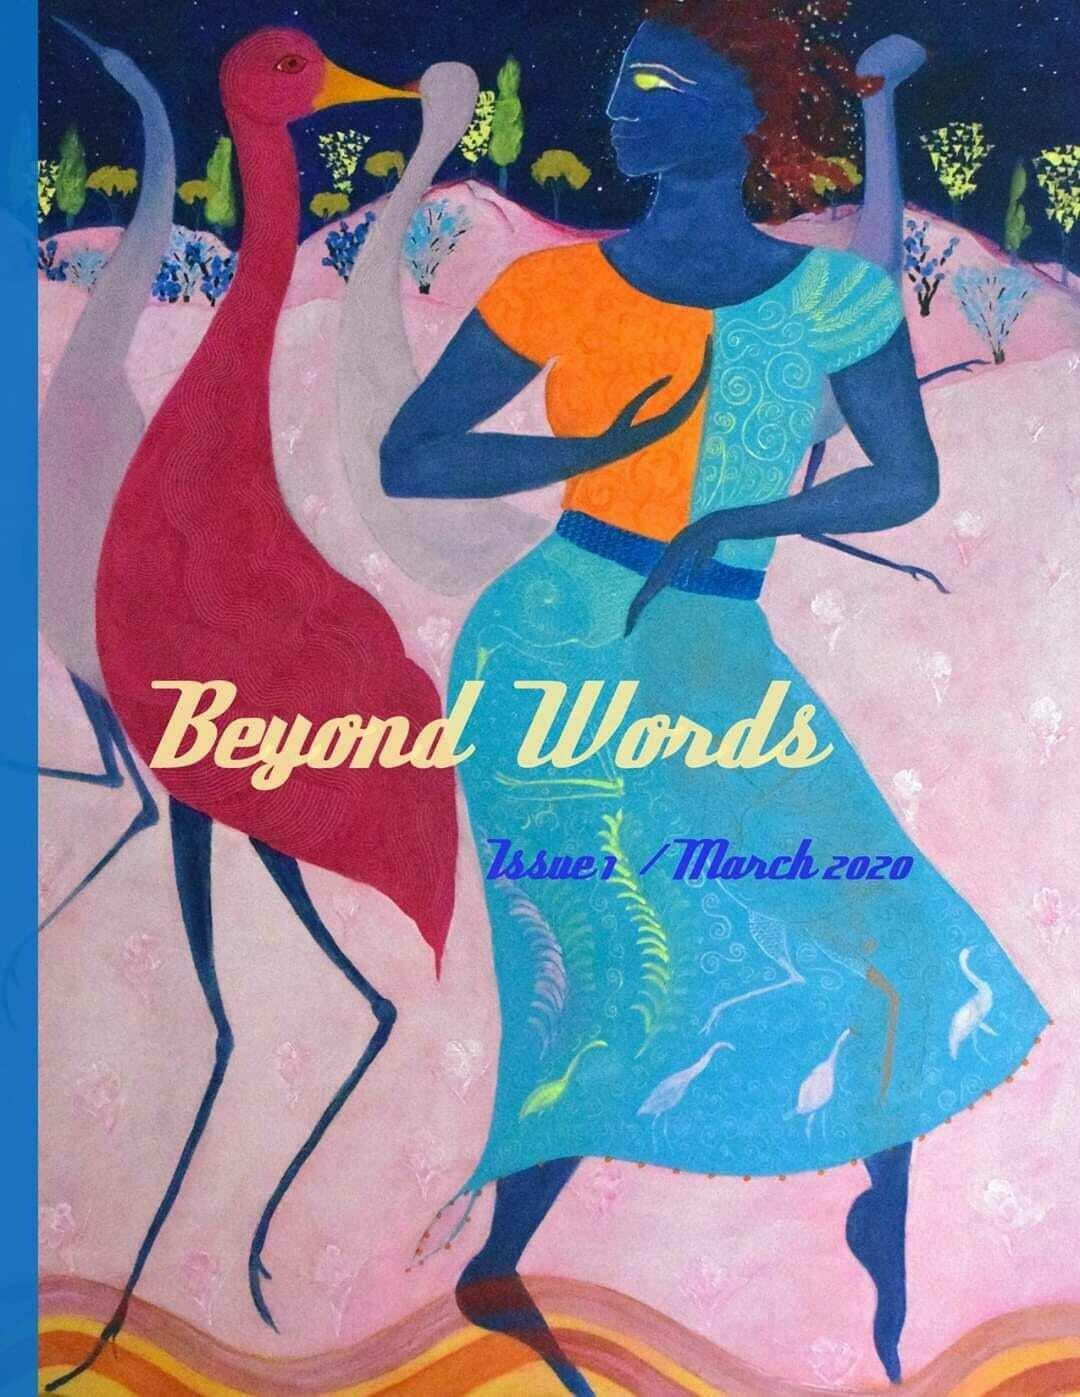 Beyond Words Magazine, Issue 1, March 2020